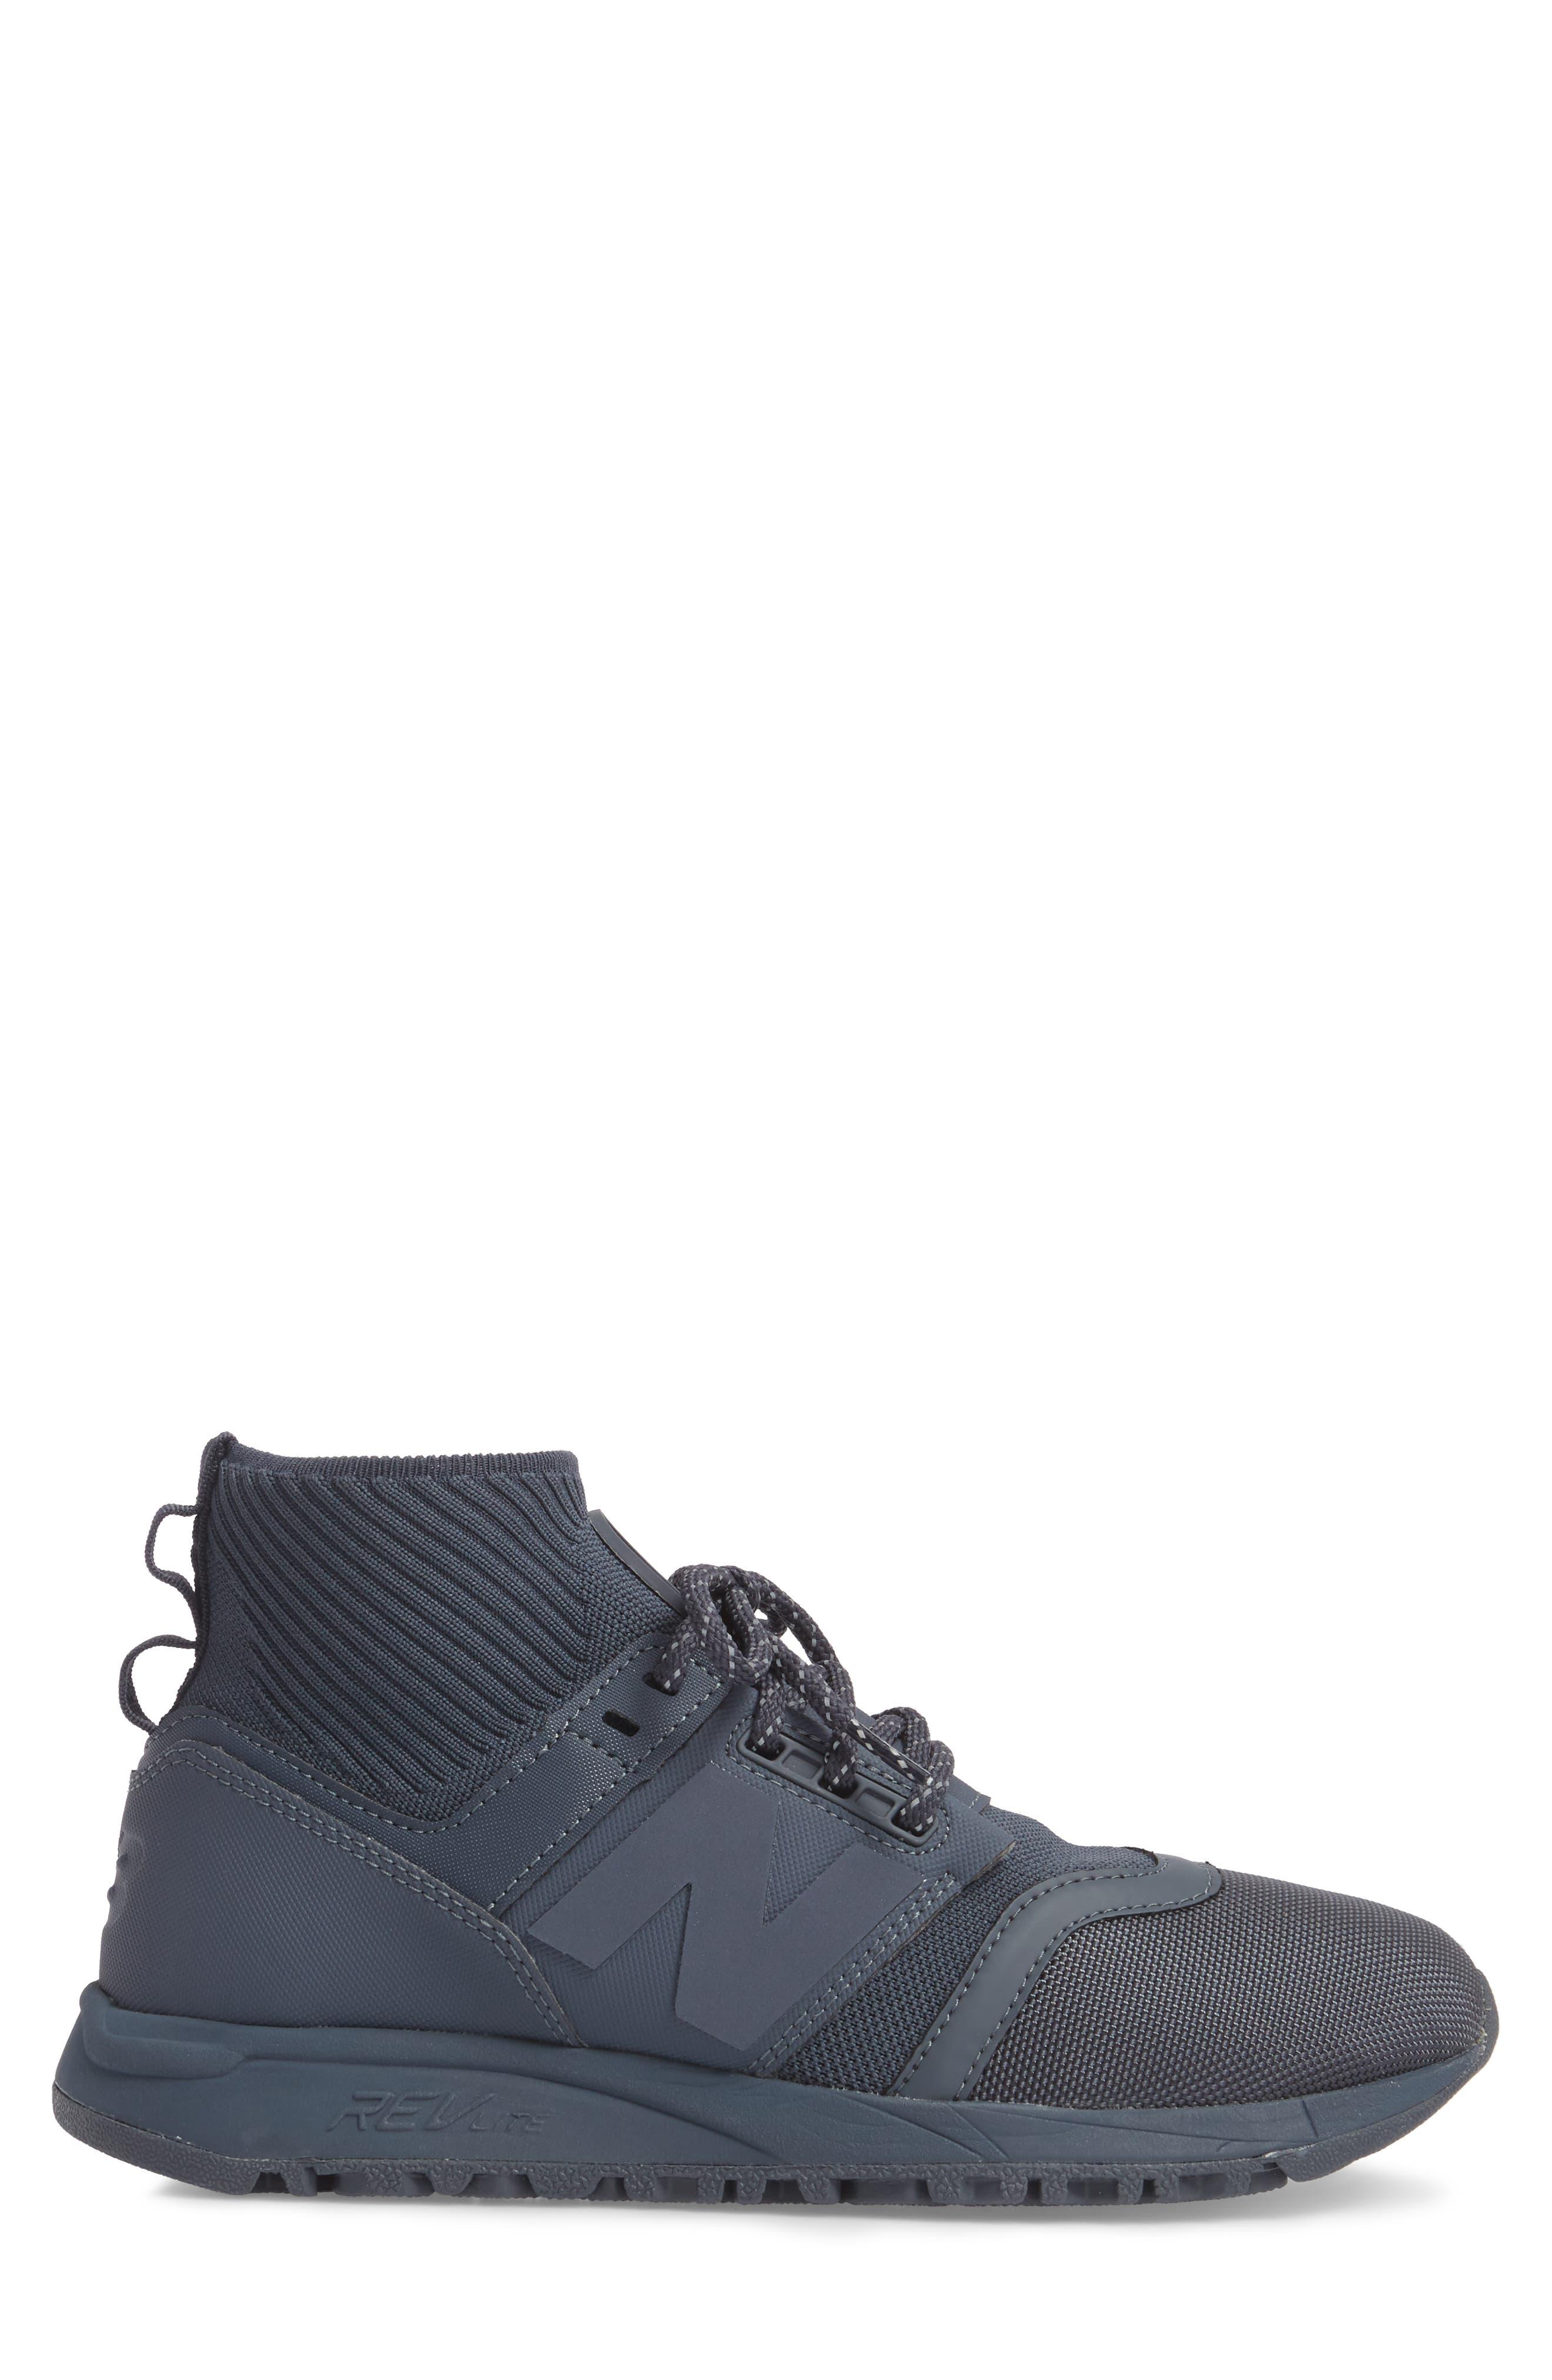 247 Mid Sneaker,                             Alternate thumbnail 12, color,